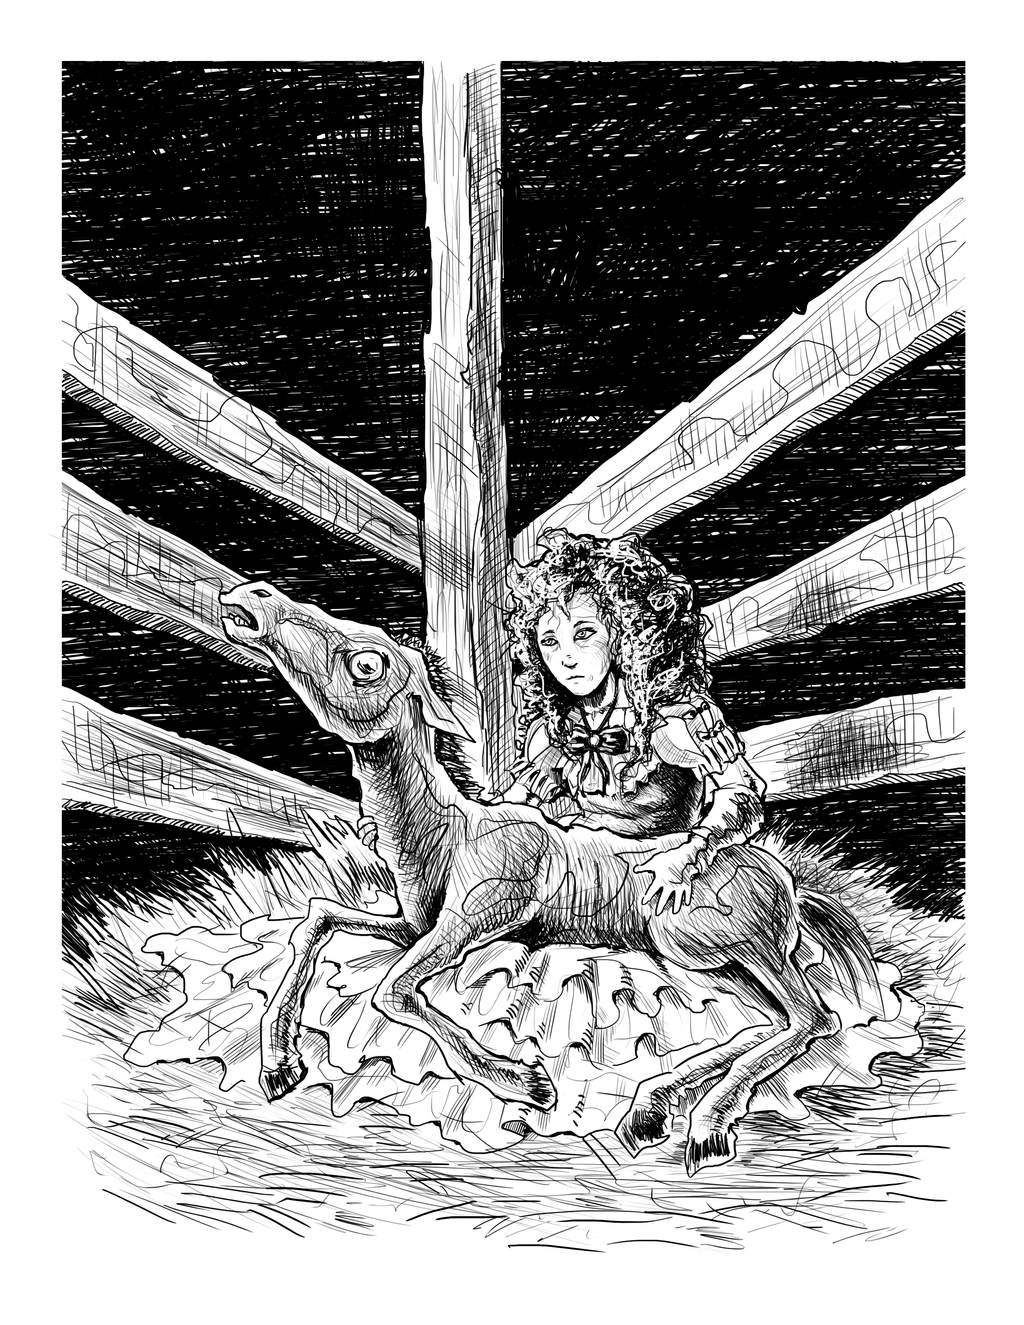 {Foal} a Travis Reynolds Illustration by ErranEntertainment